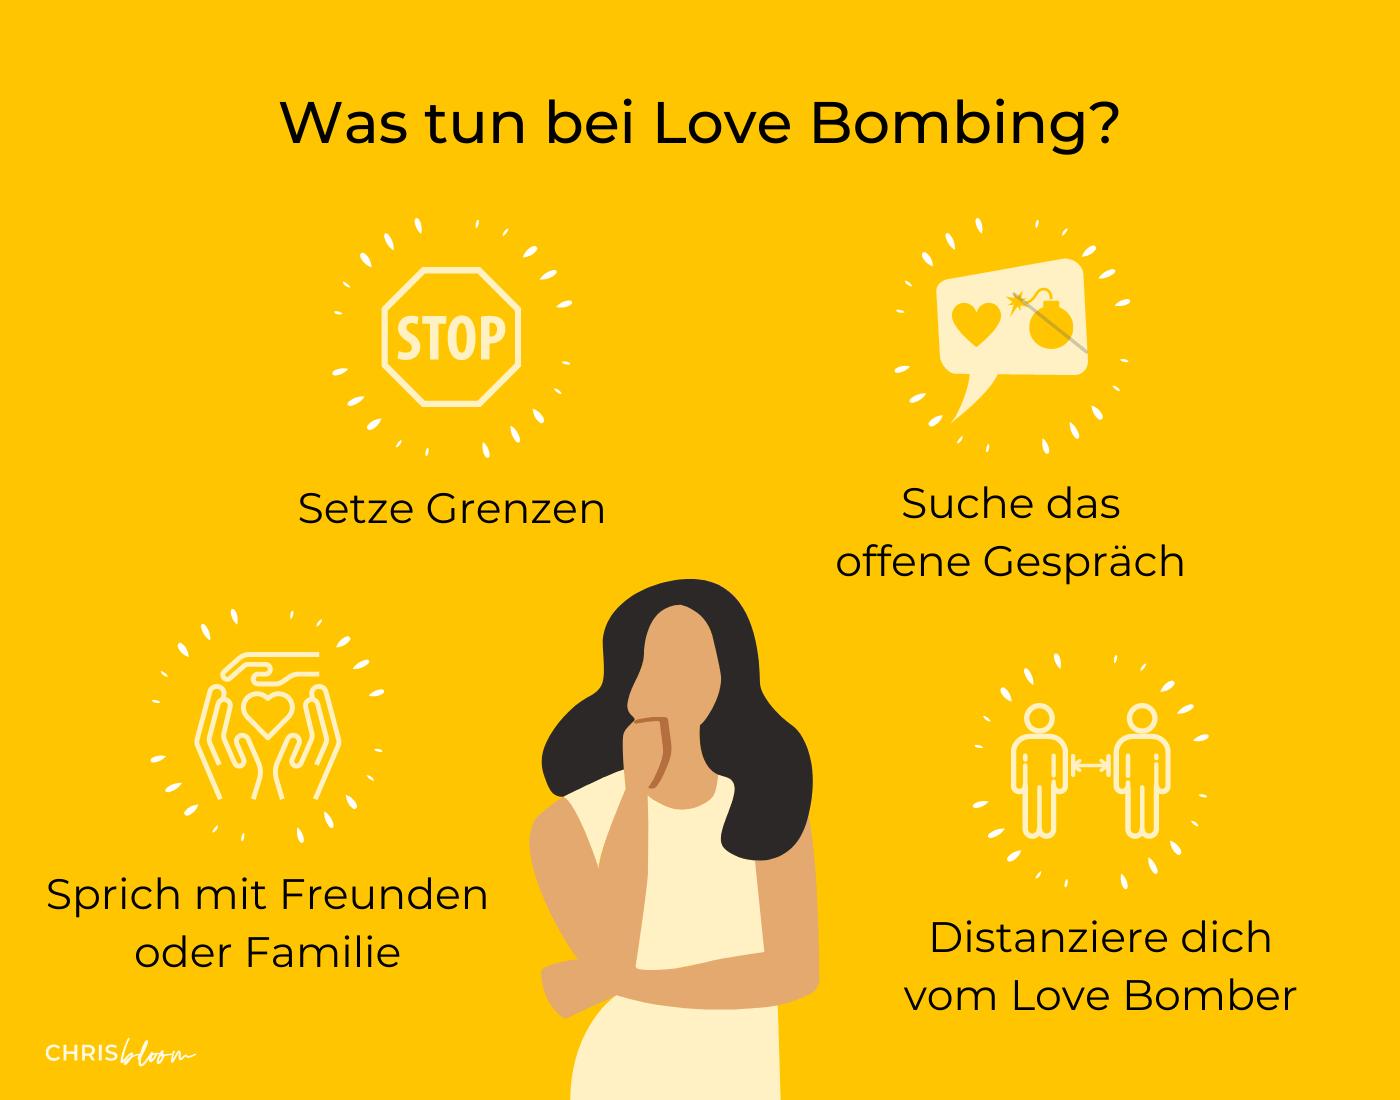 Was tun bei Love Bombing?